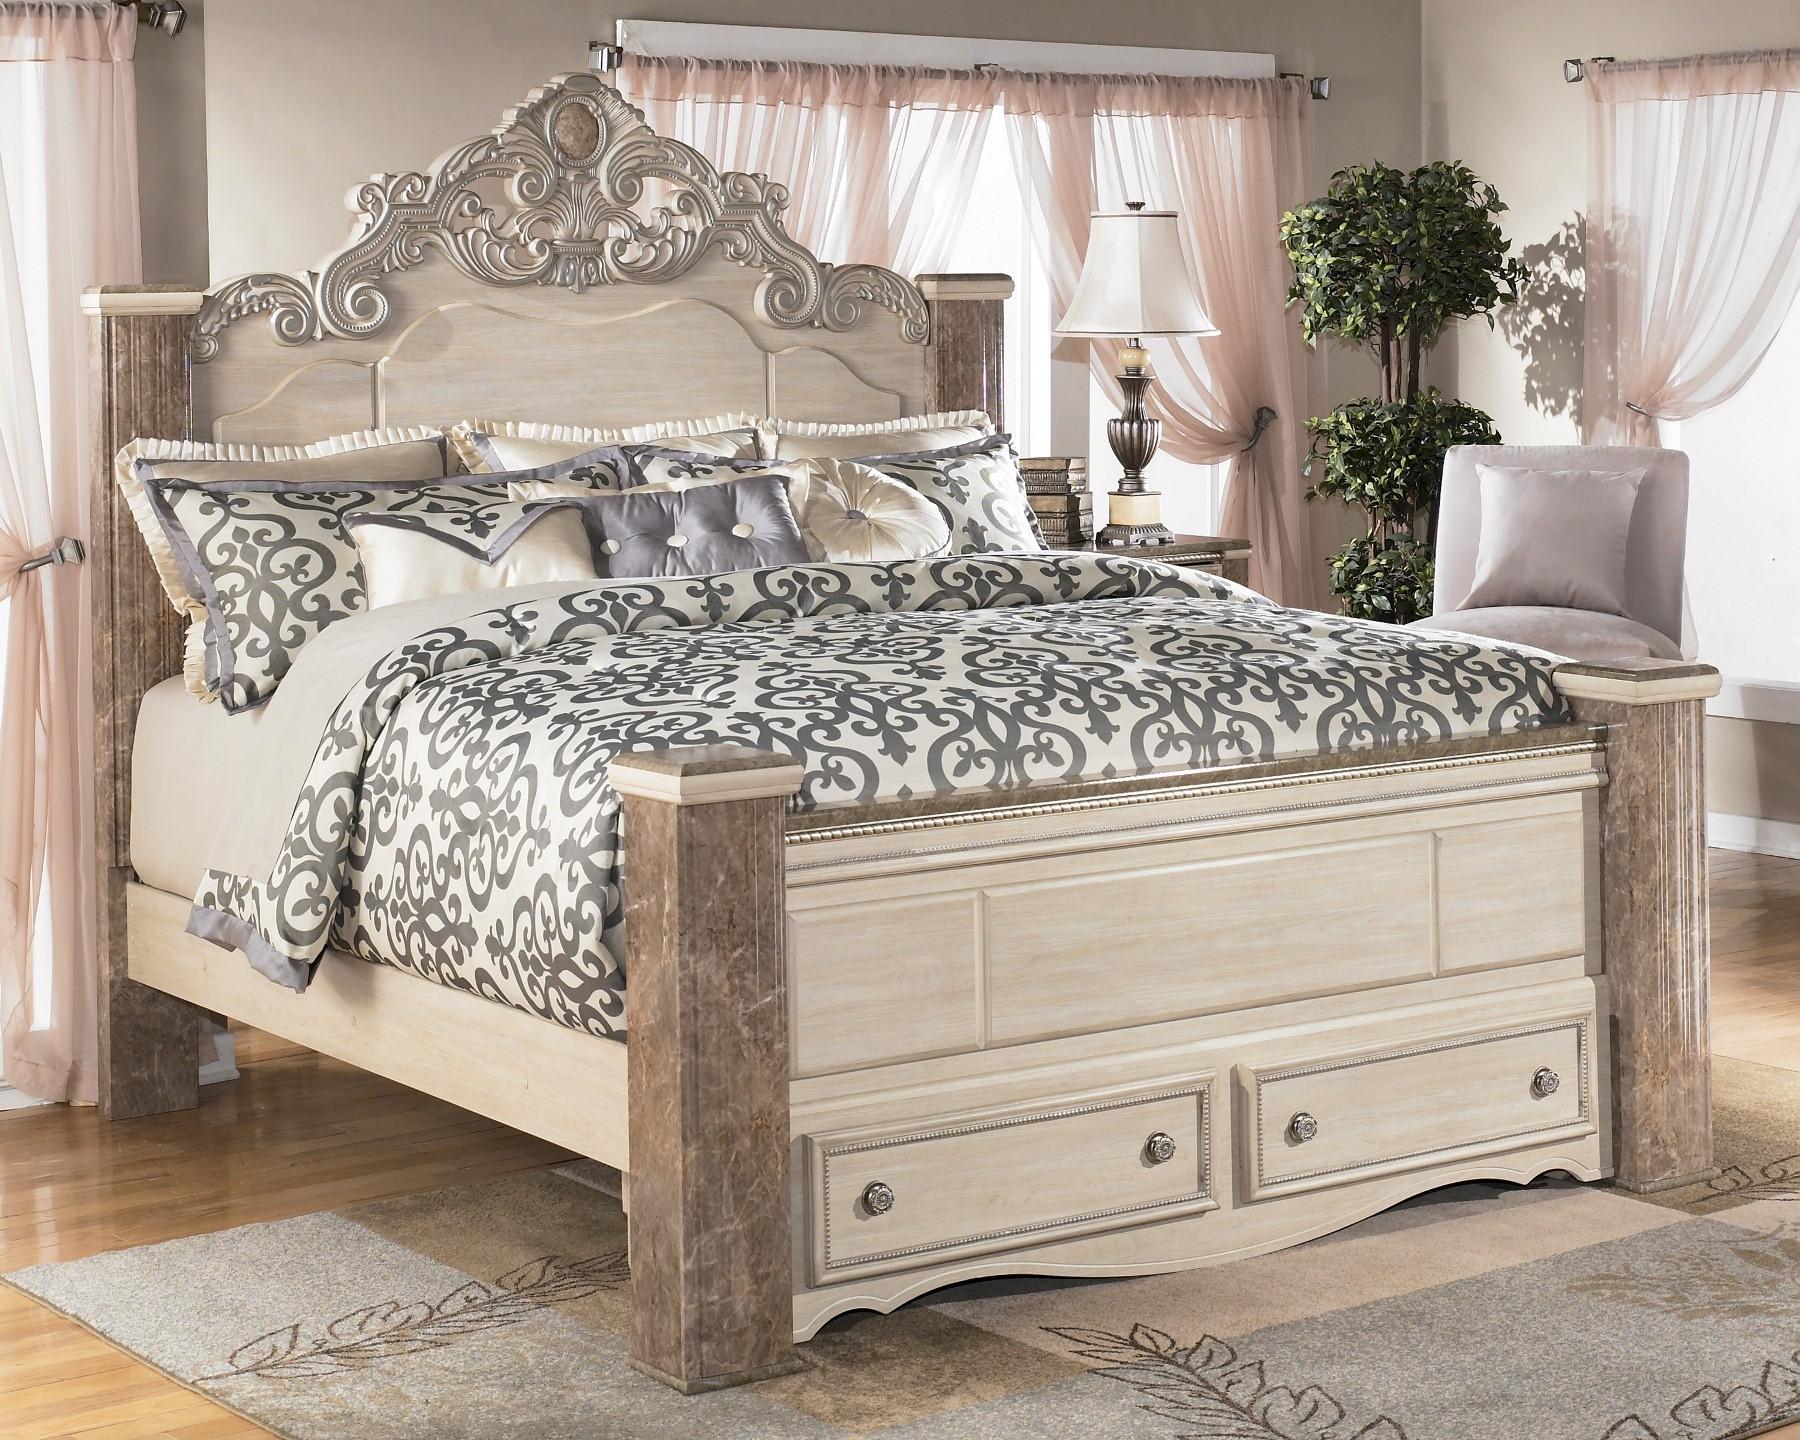 Bedroom Sets Ashley Furniture > PierPointSprings.com